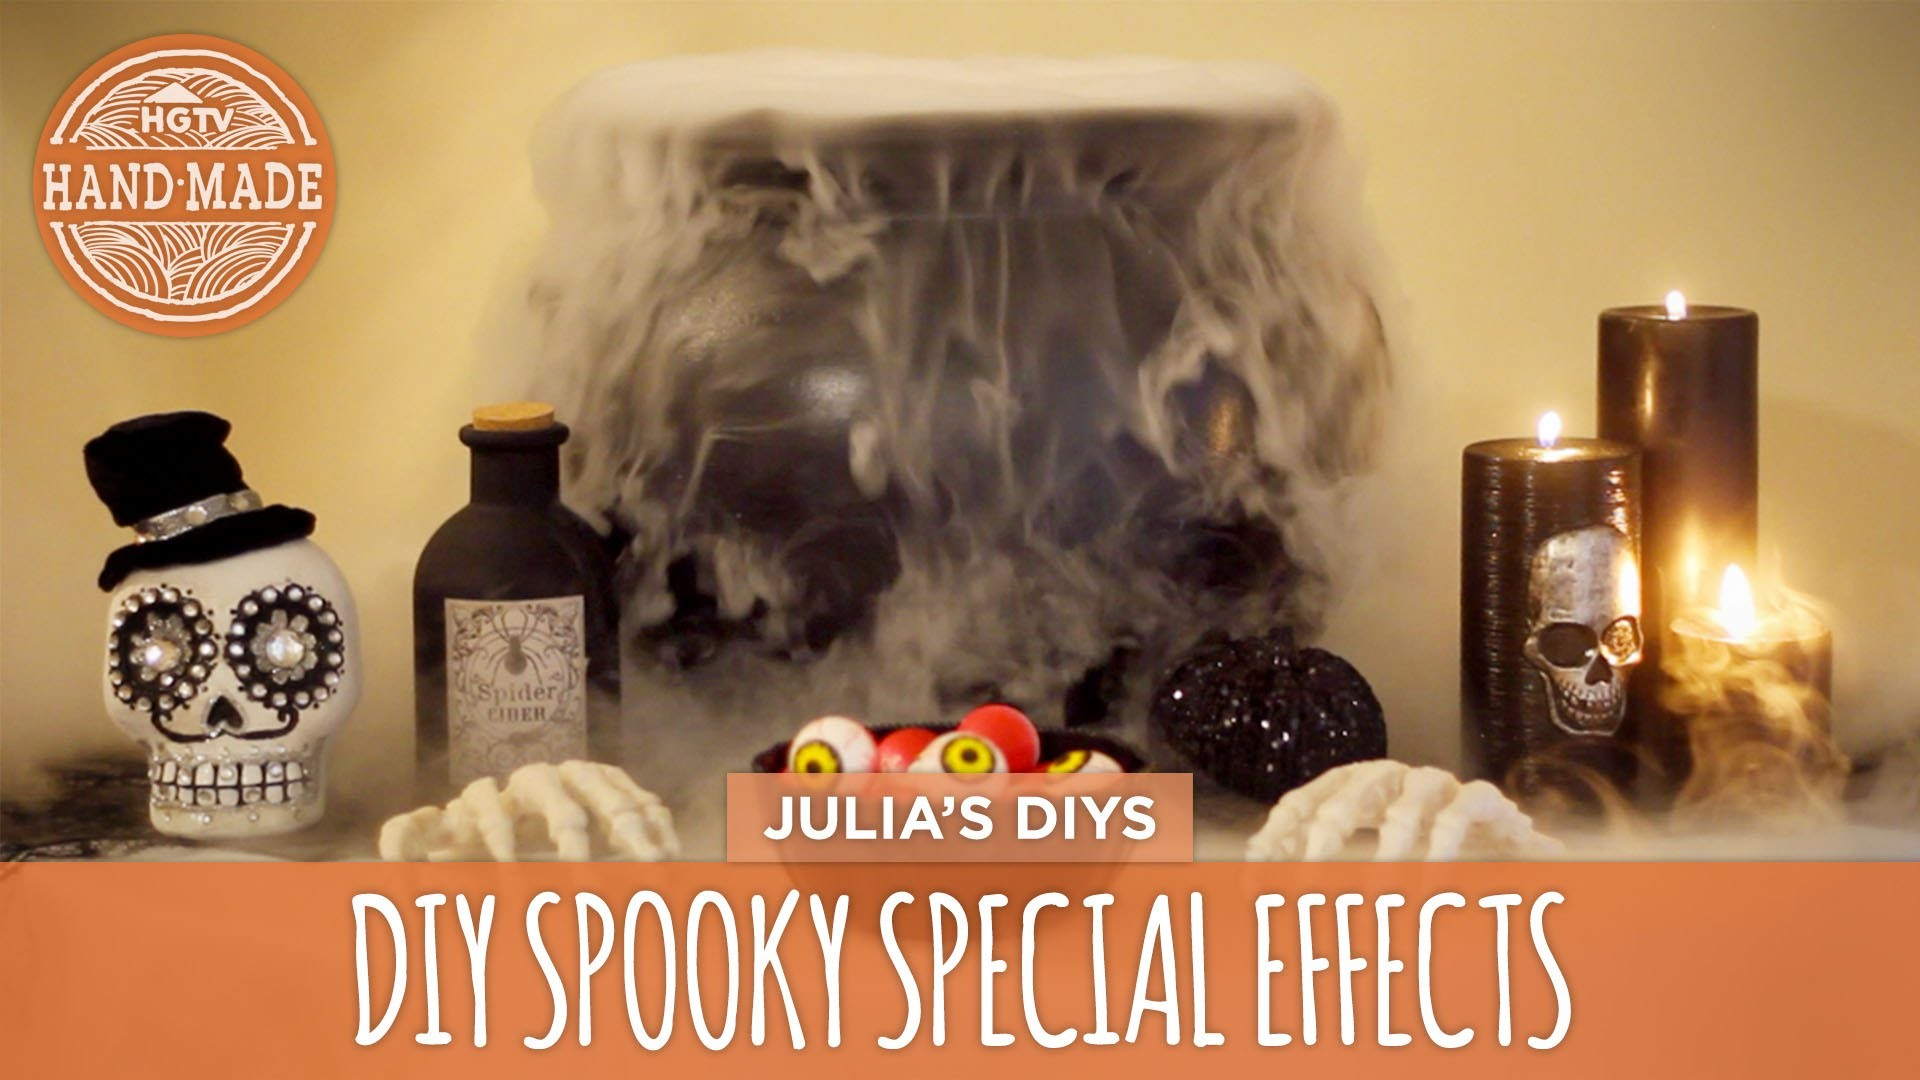 DIY Spooky Special Effects - HGTV Handmade